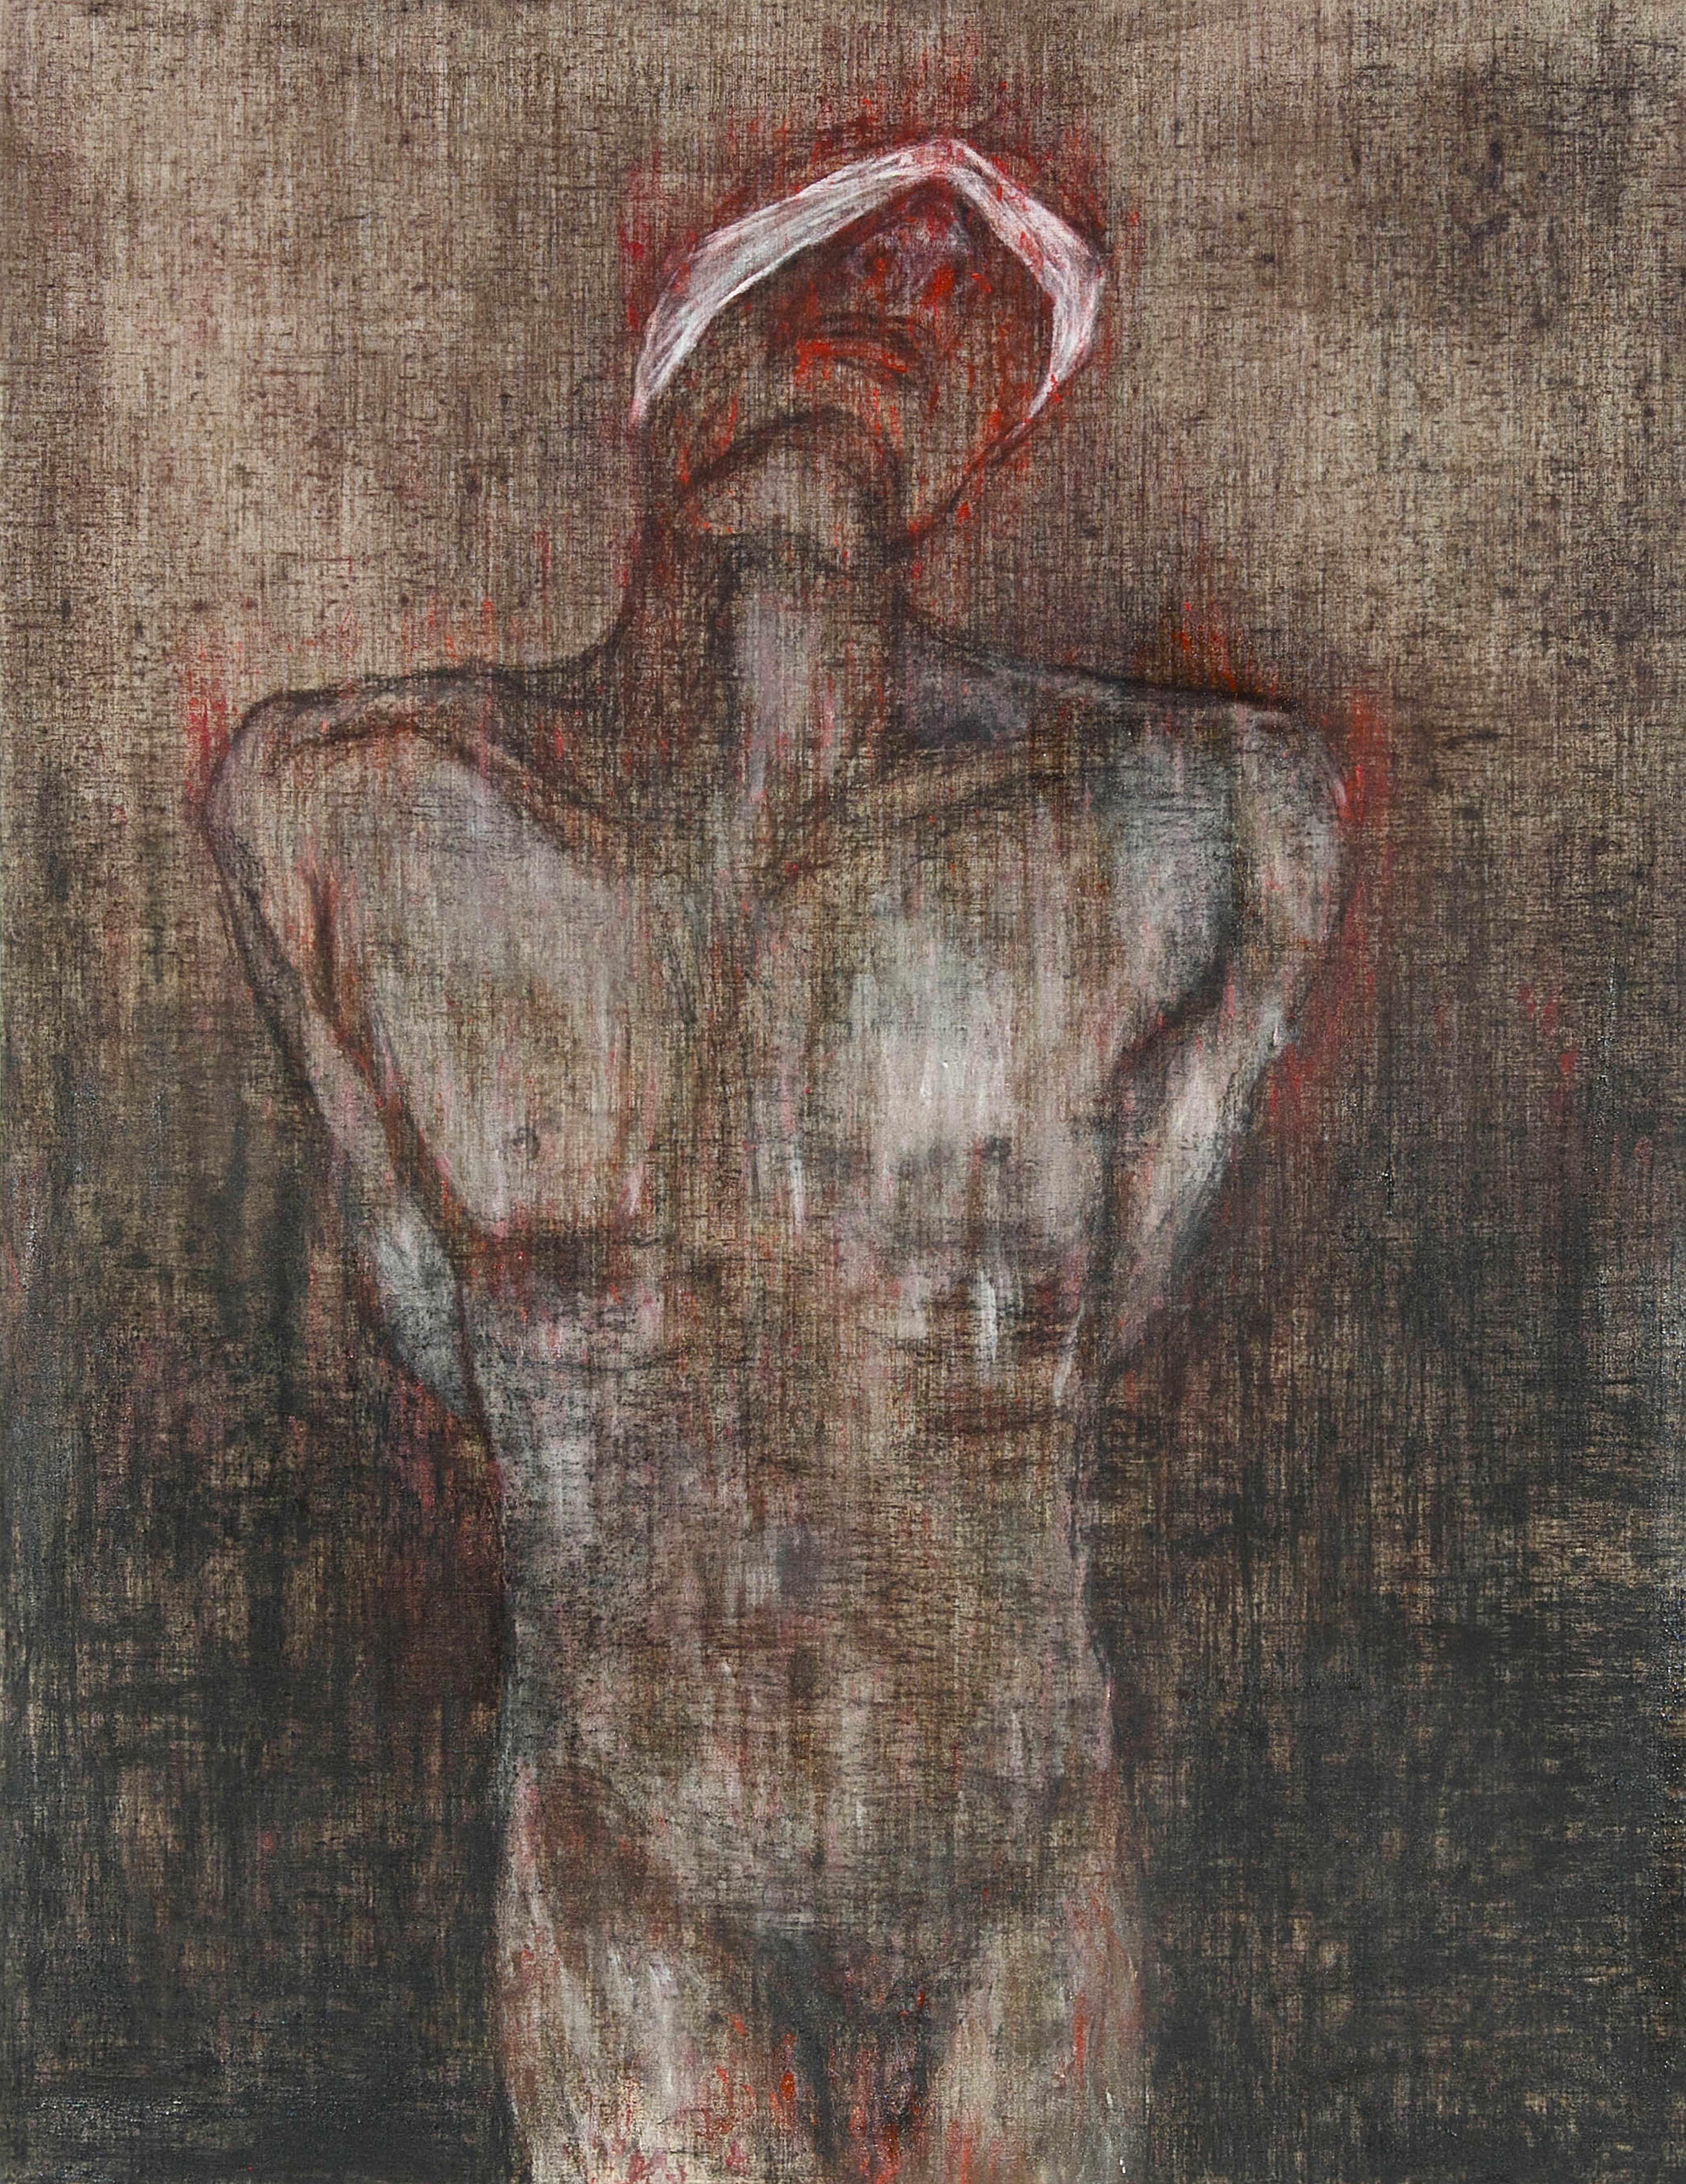 Ciduk, Siksa, Bunuh, Buang III (2018) Acrylic and charcoal on canvas; 162cm x 127cm